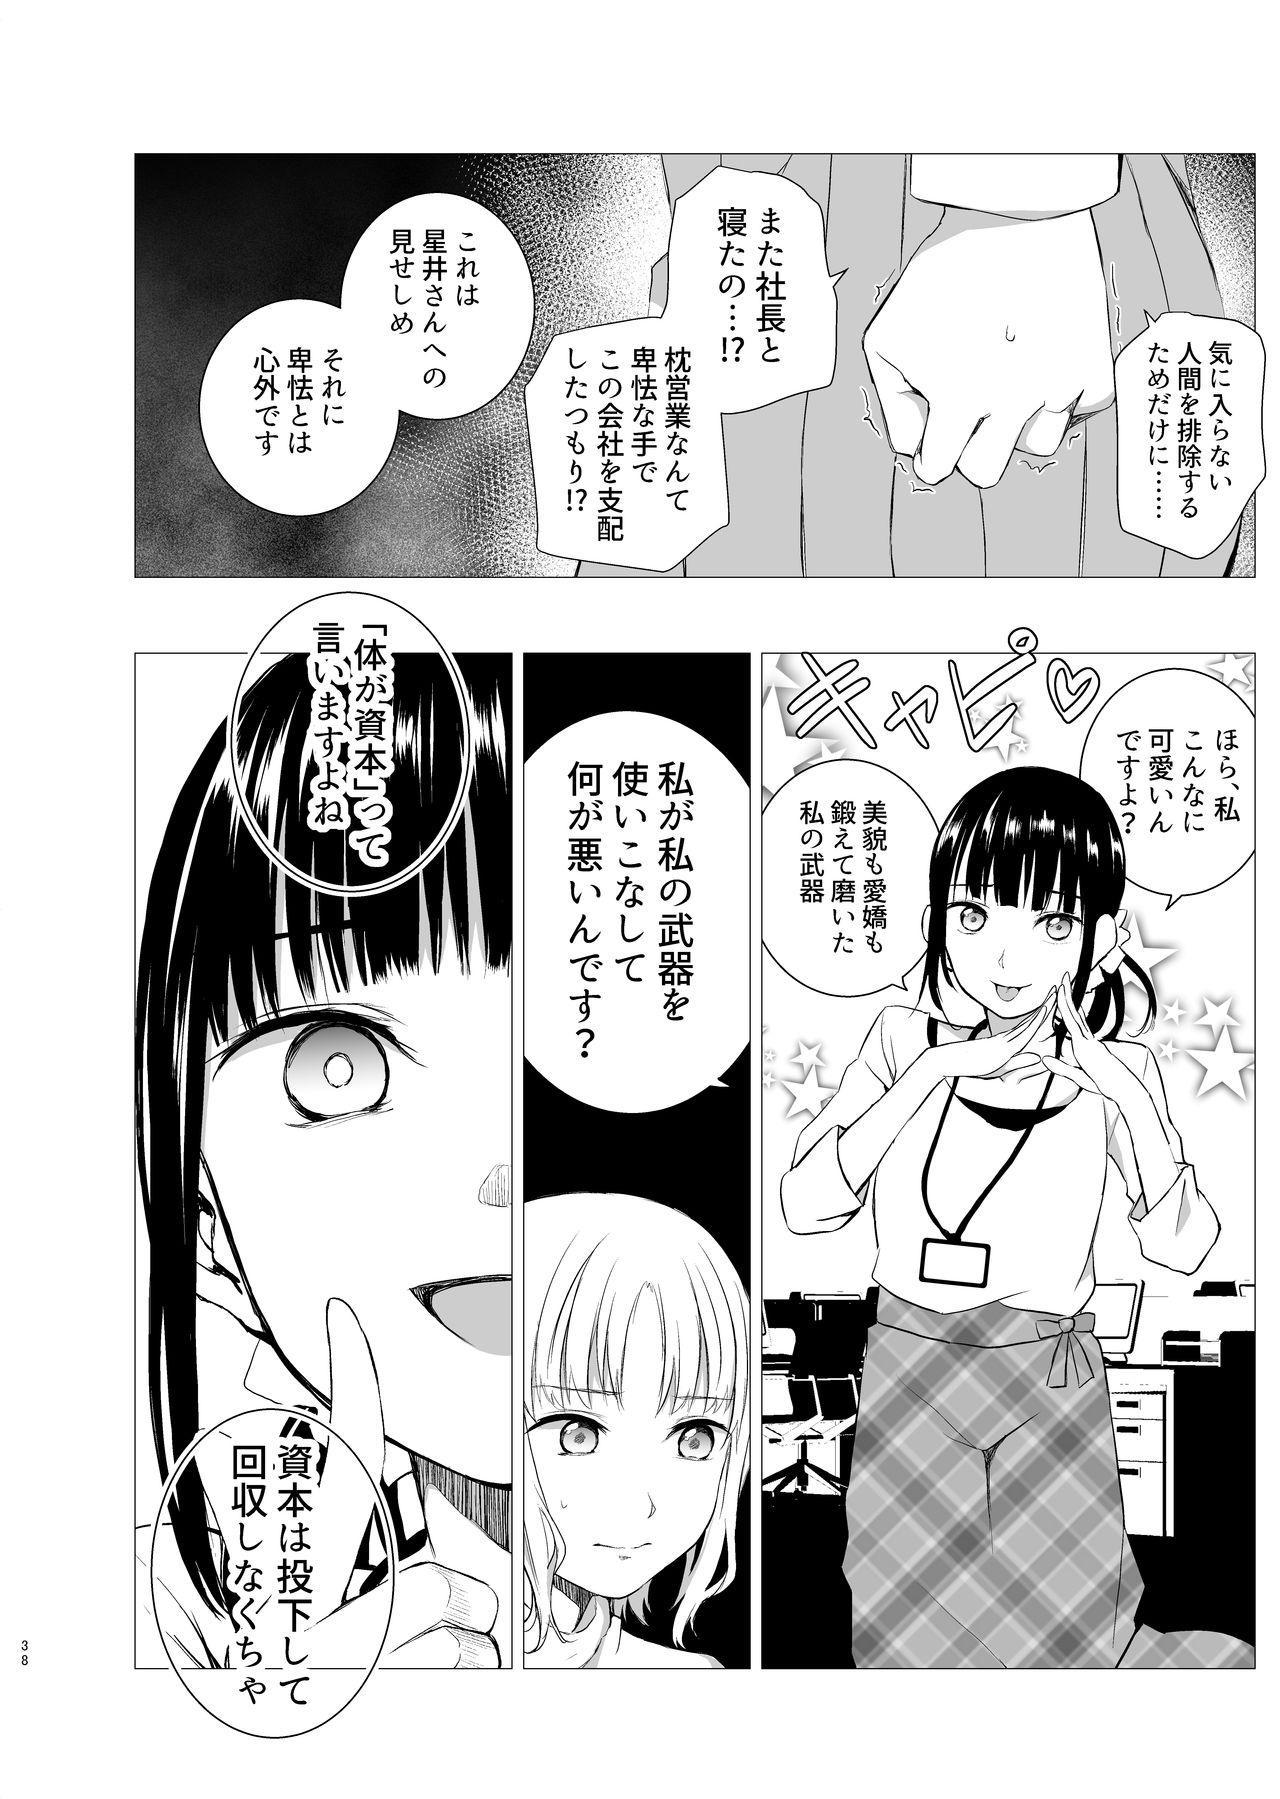 Hanayomi no Makurakotoba 36